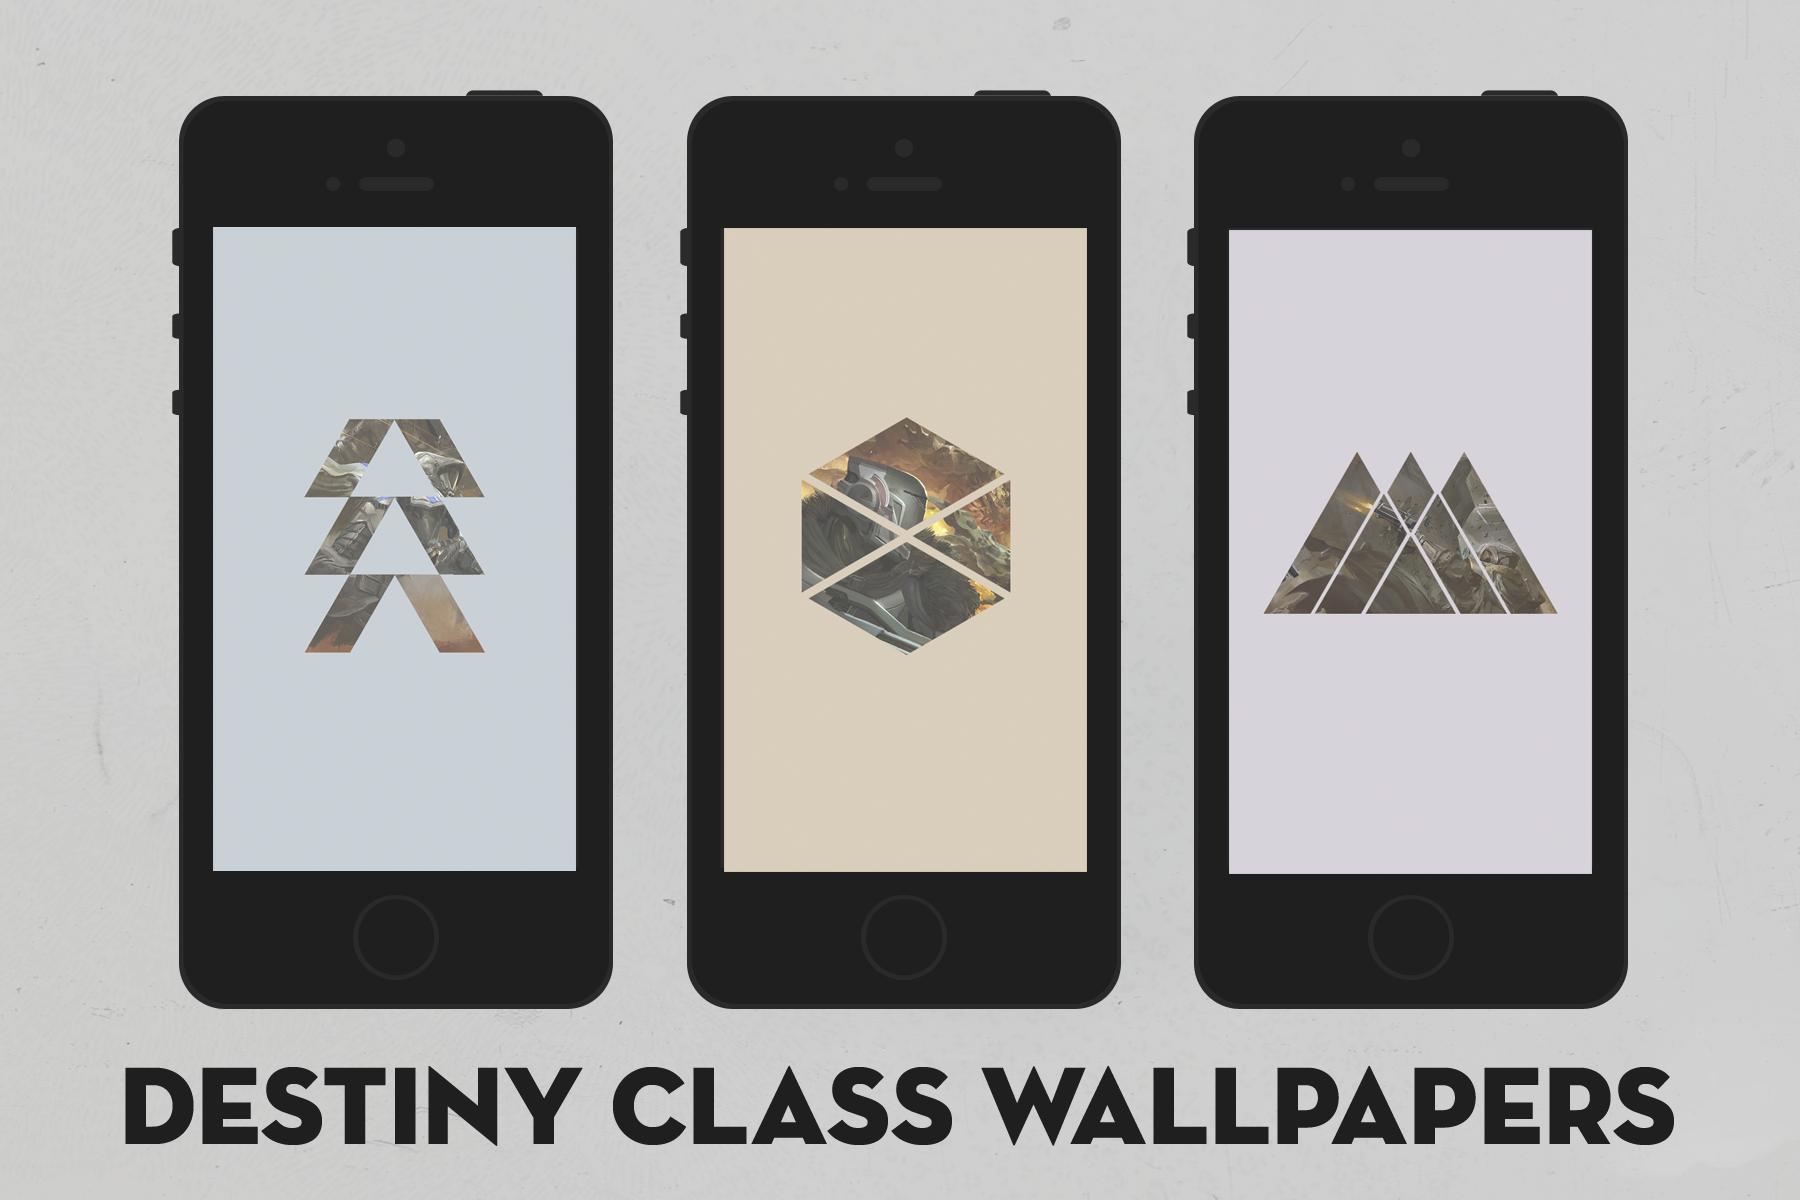 Destiny class wallpapers by xeromatt on deviantart